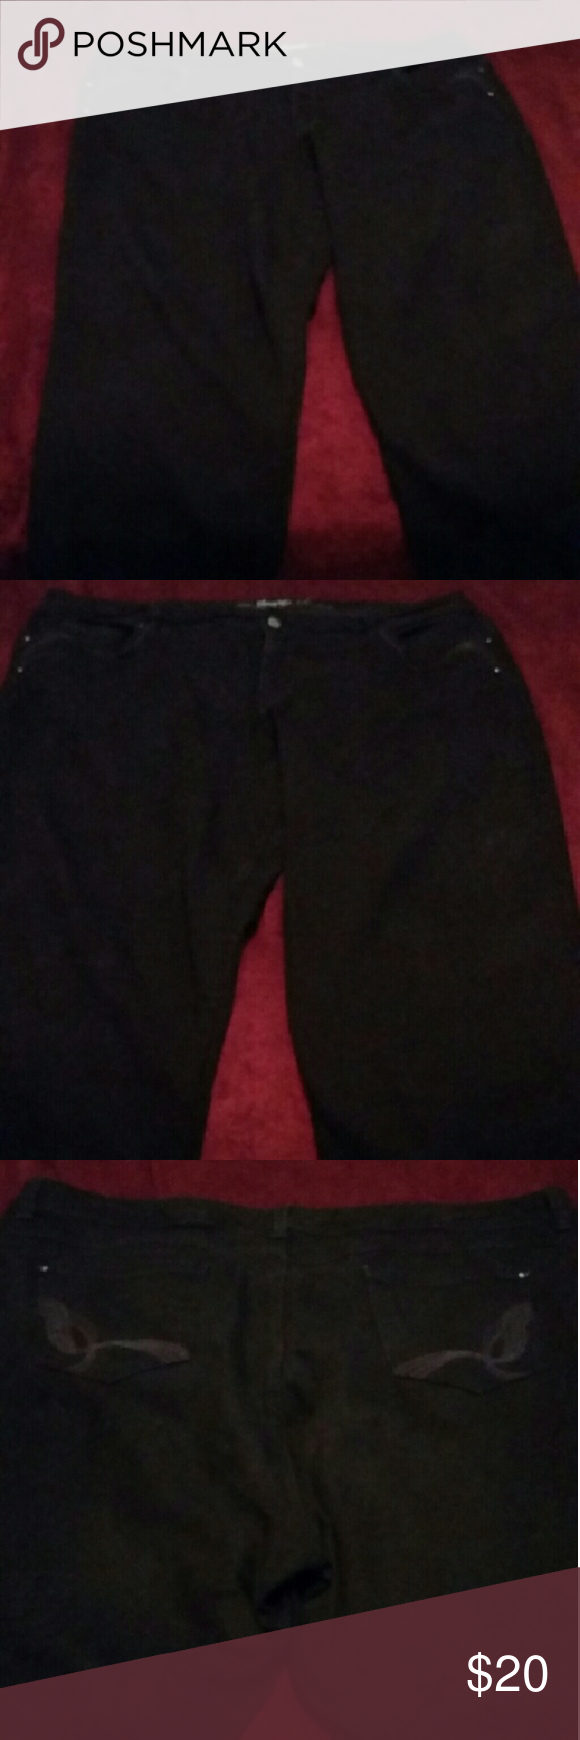 Gloria Vanderbilt Black Jeans - 24W Gloria Vanderbilt Black Jeans - 24W  All Around Slimming Effect Like New Condition   Discount on Bundles  Please No Low Balling Gloria Vanderbilt Jeans Straight Leg